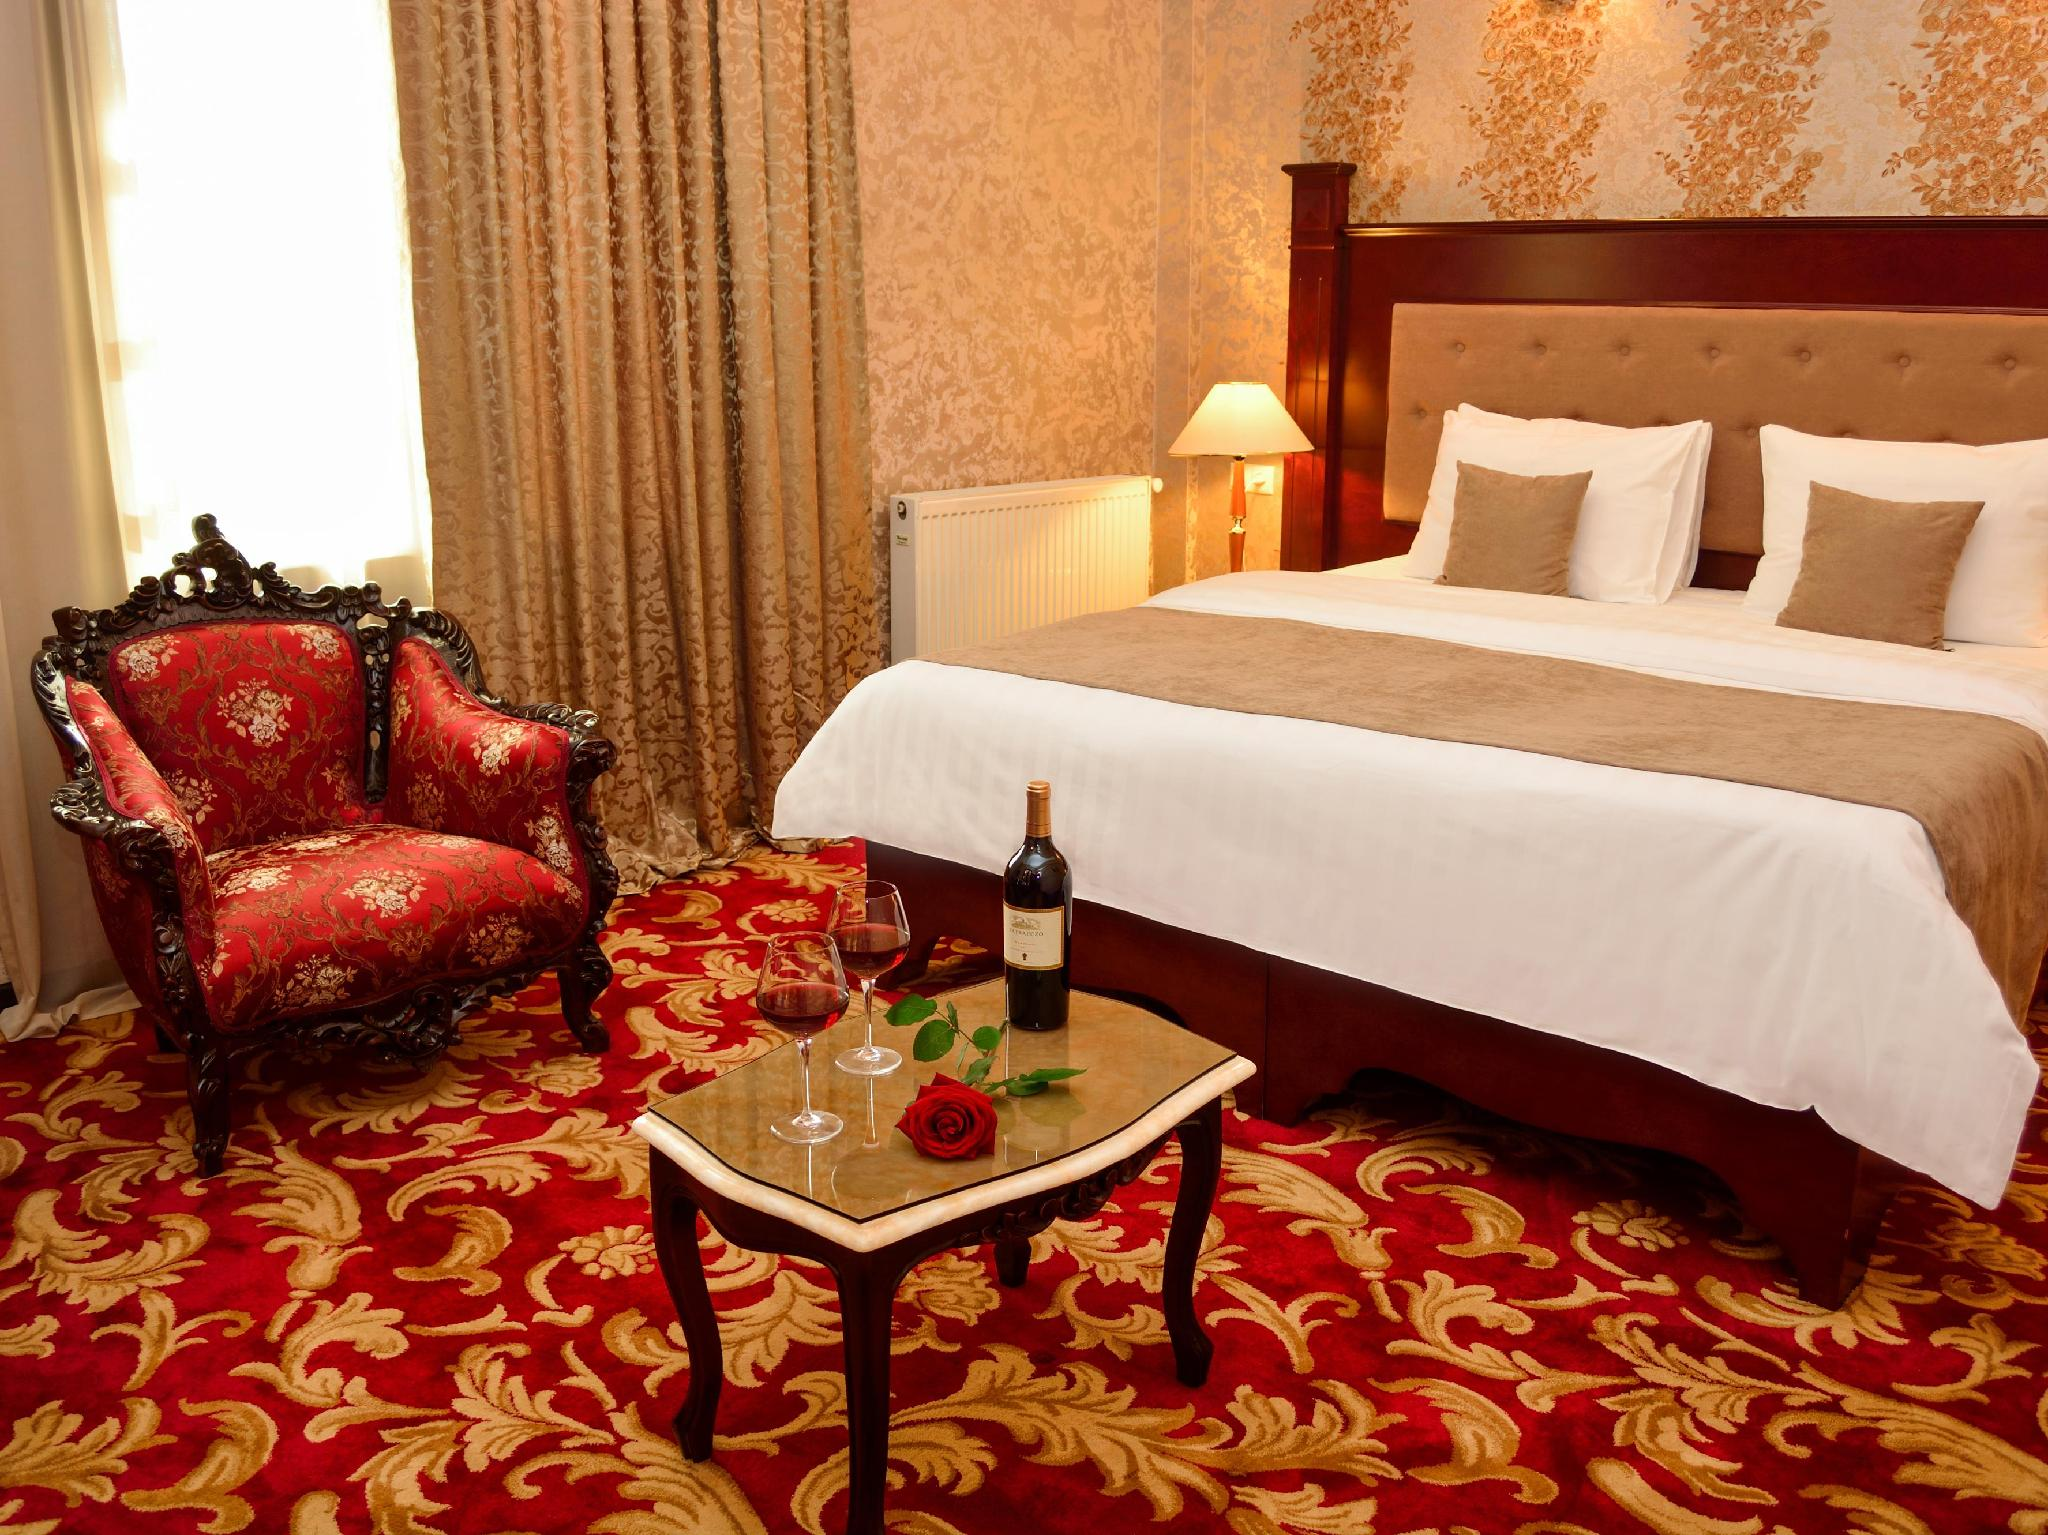 Tbilisi Laerton Hotel - Tbilisi